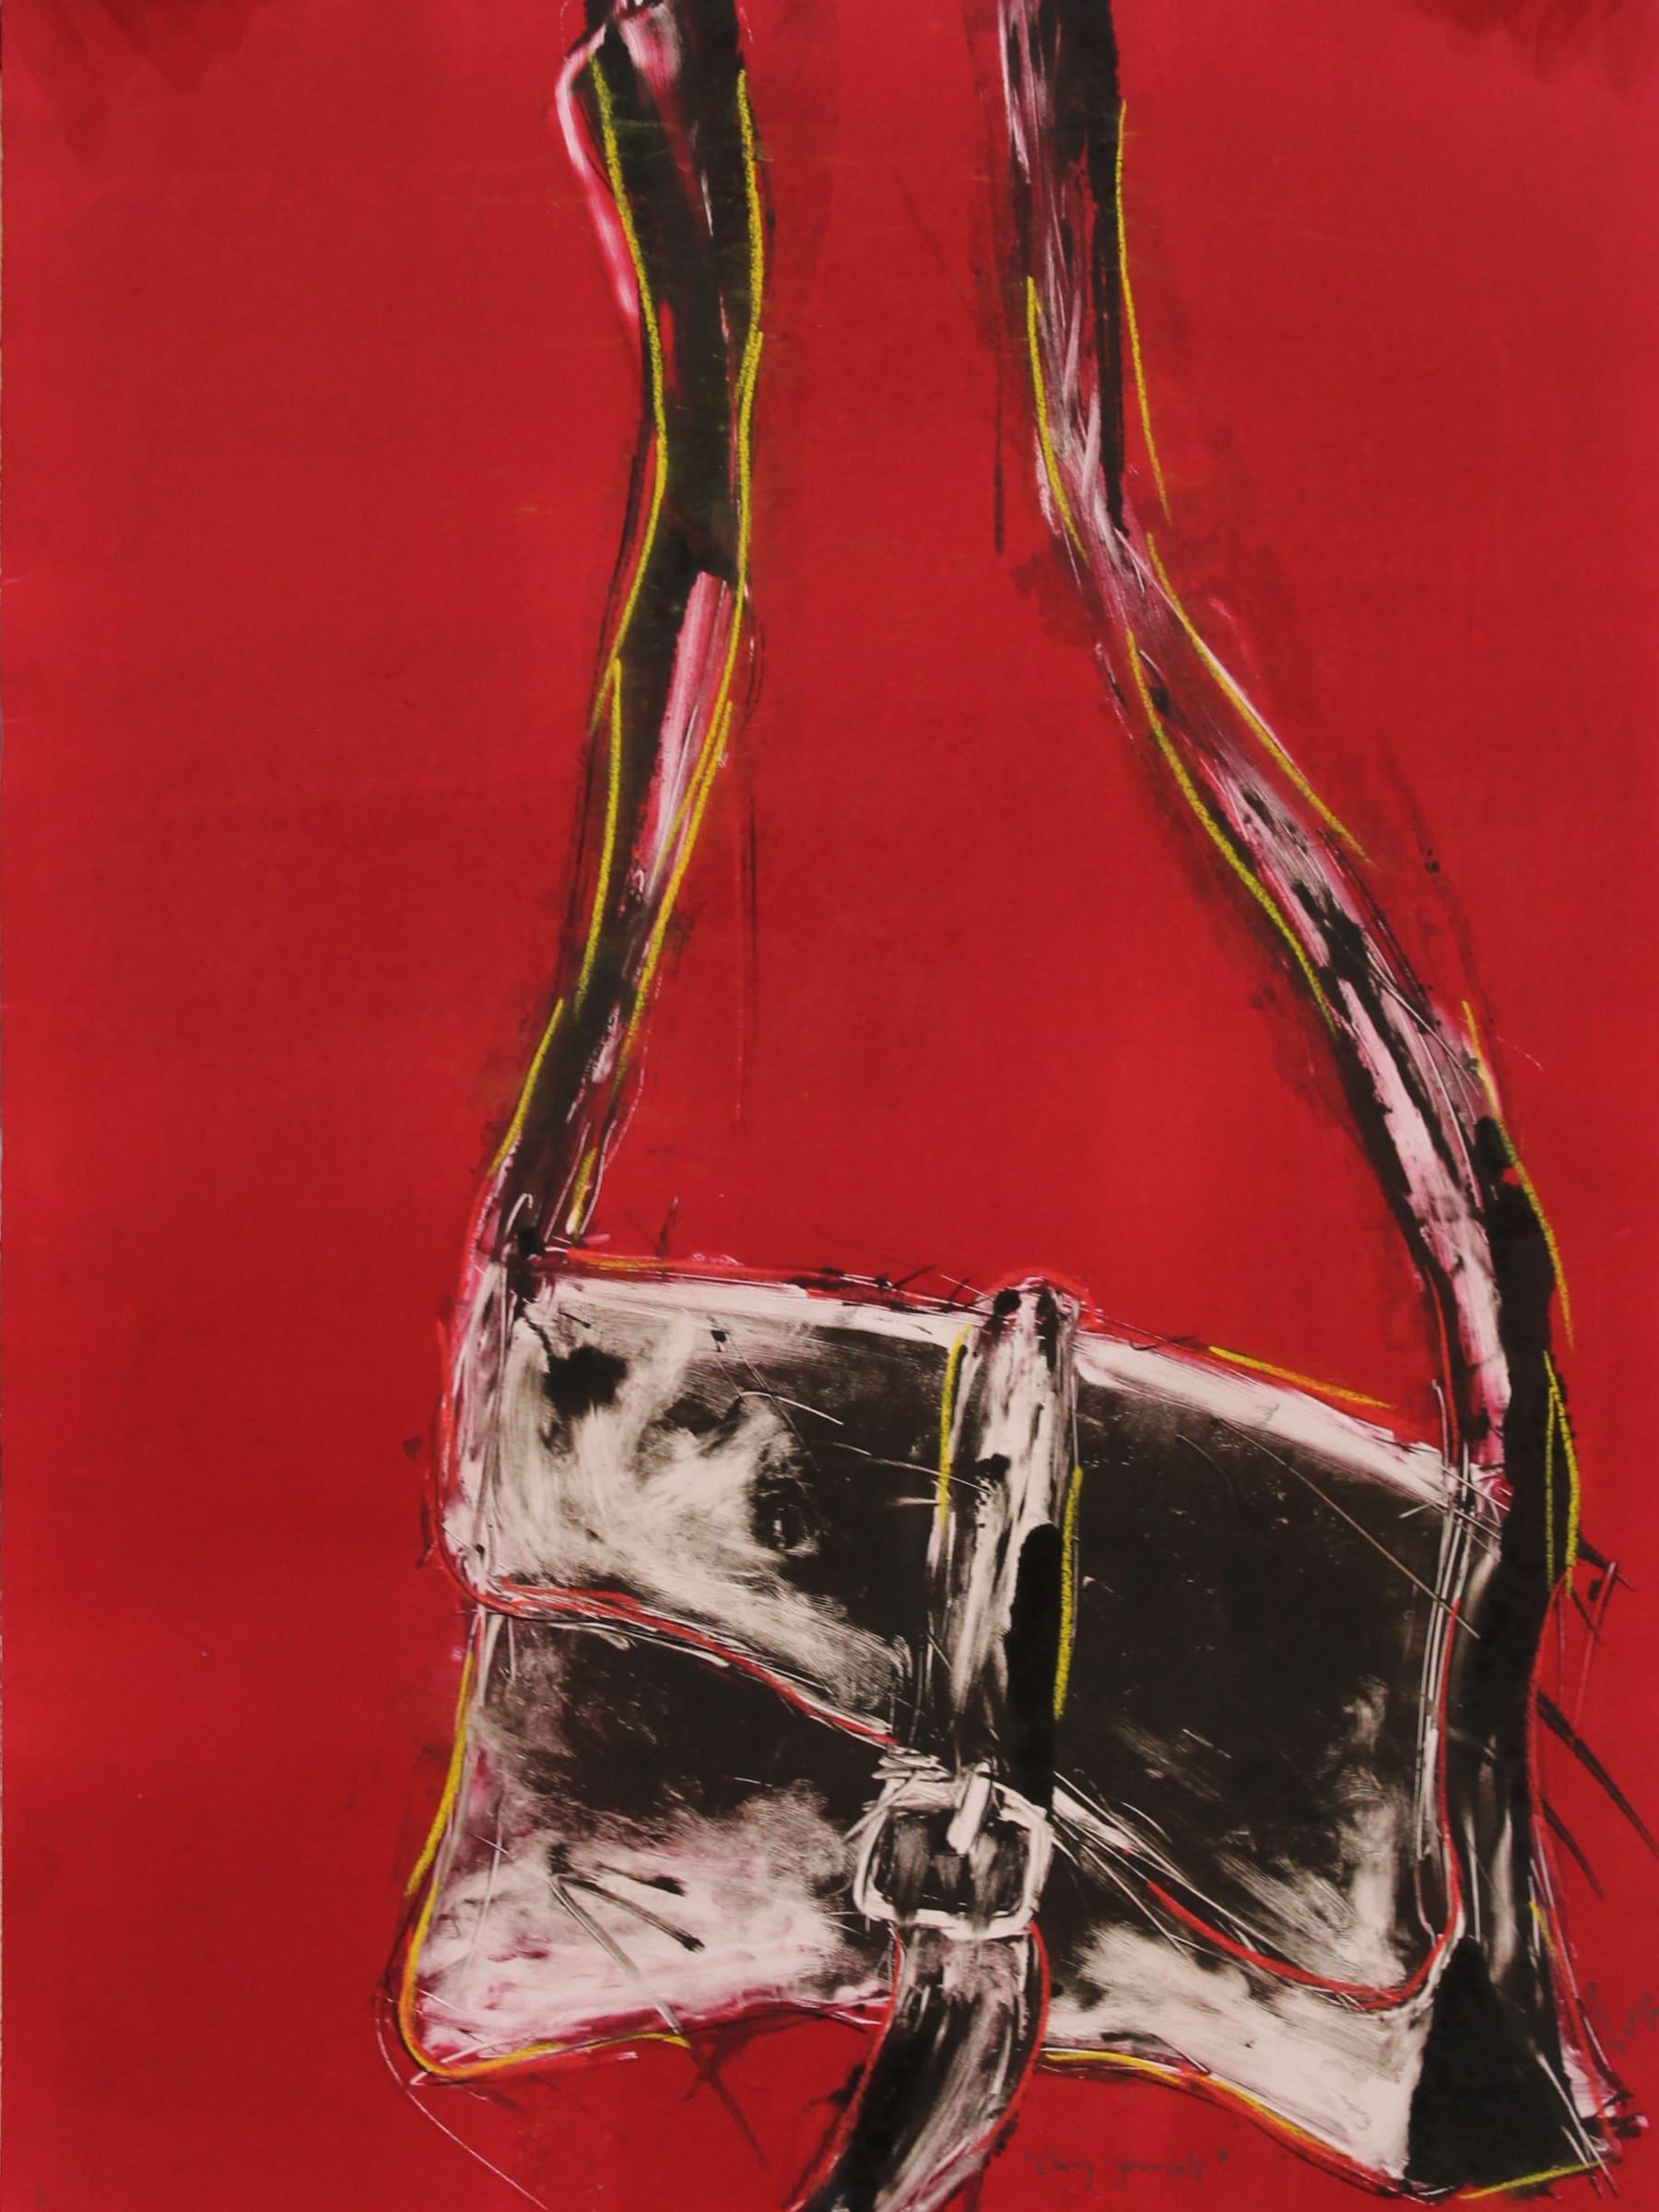 <span class=&#34;link fancybox-details-link&#34;><a href=&#34;/artists/63-senzo-shabangu/works/1038-senzo-shabangu-carry-yourself-2016/&#34;>View Detail Page</a></span><div class=&#34;artist&#34;><strong>Senzo Shabangu</strong></div> <div class=&#34;title&#34;><em>Carry Yourself</em>, 2016</div> <div class=&#34;medium&#34;>Monotype And Soft Pastel On Fabriano</div> <div class=&#34;dimensions&#34;>76cm x 56cm (95cm x 75cm framed)</div><div class=&#34;price&#34;>R21,840.00</div>